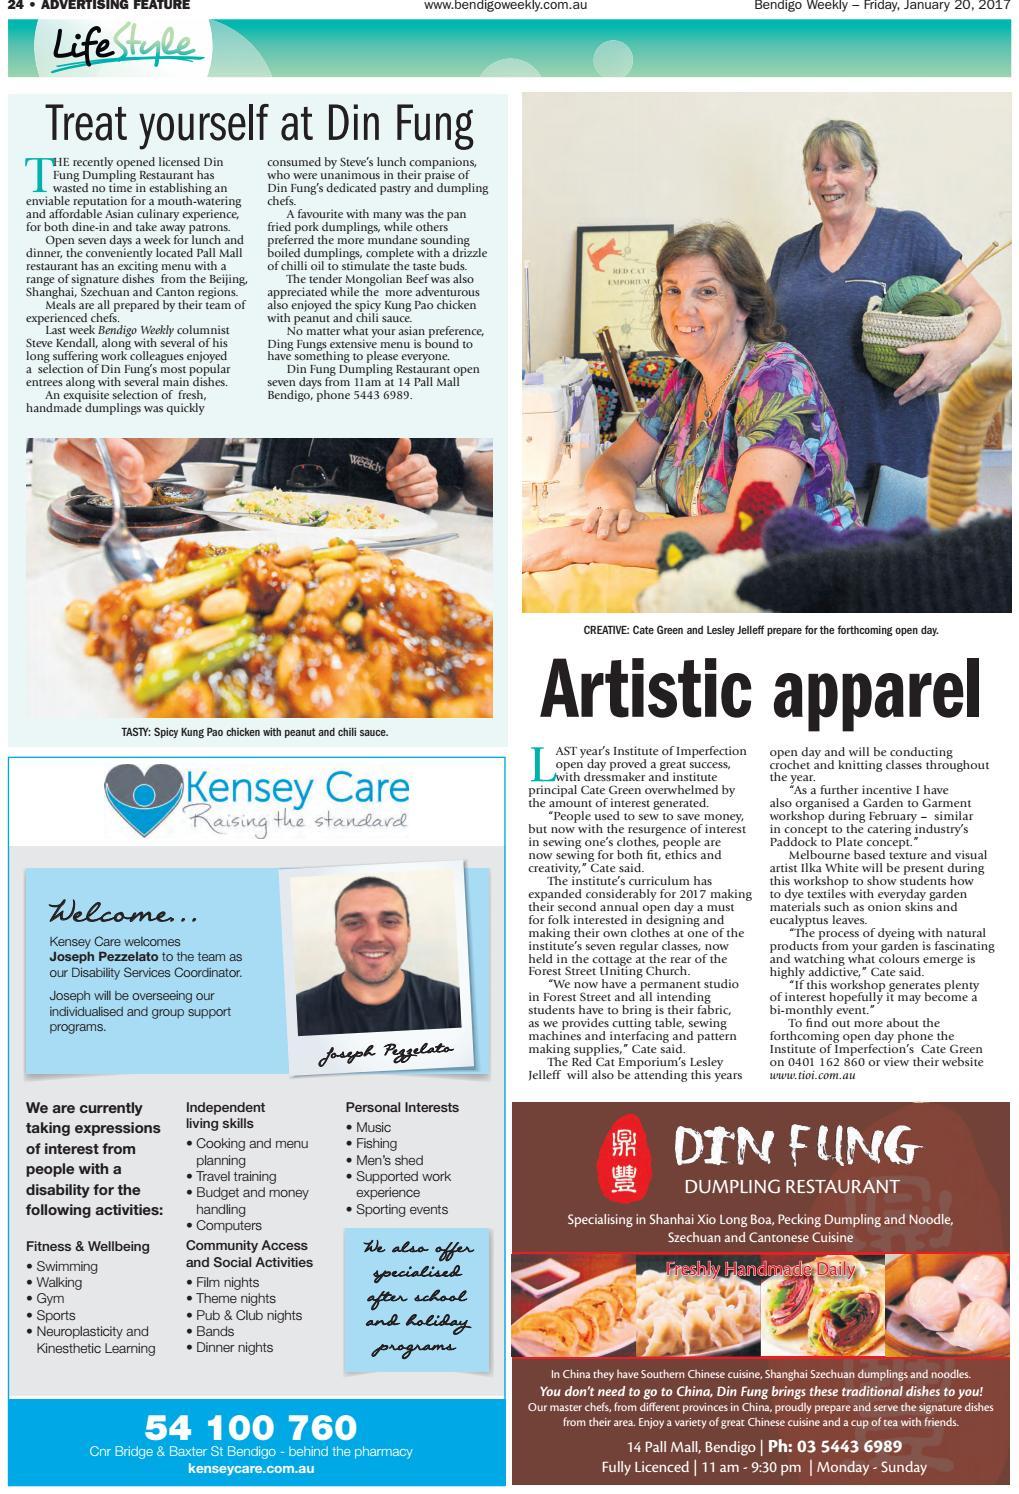 Bendigo Weekly 1002 by Bendigo Weekly - issuu